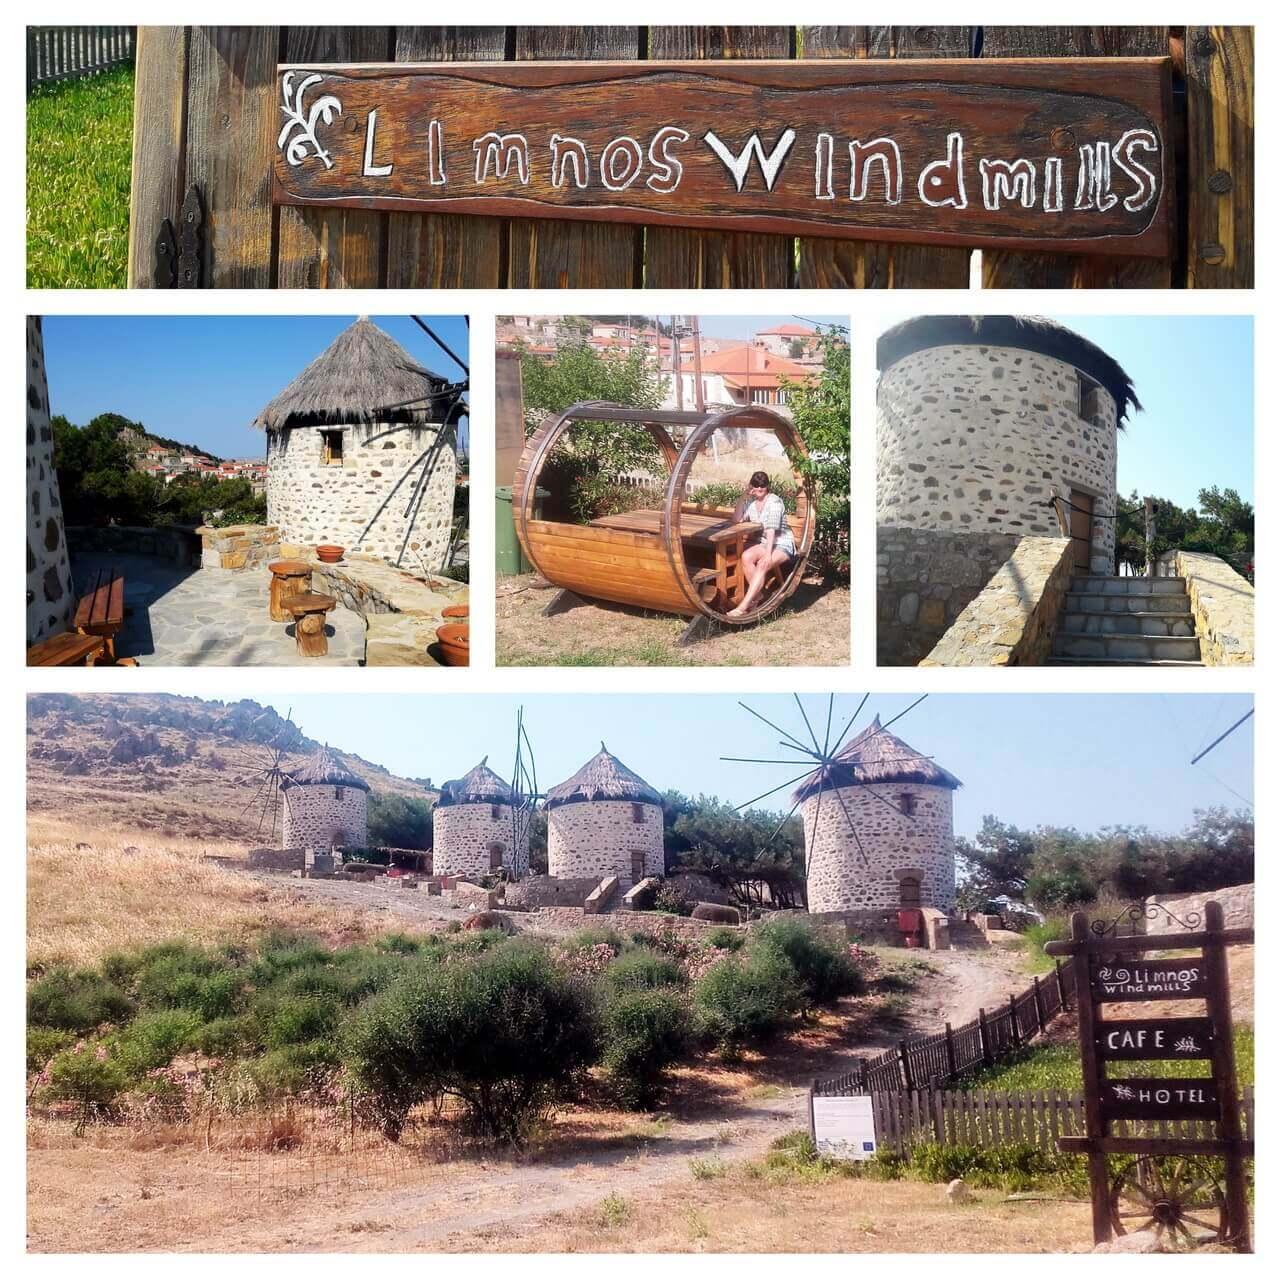 Limnos Windmills